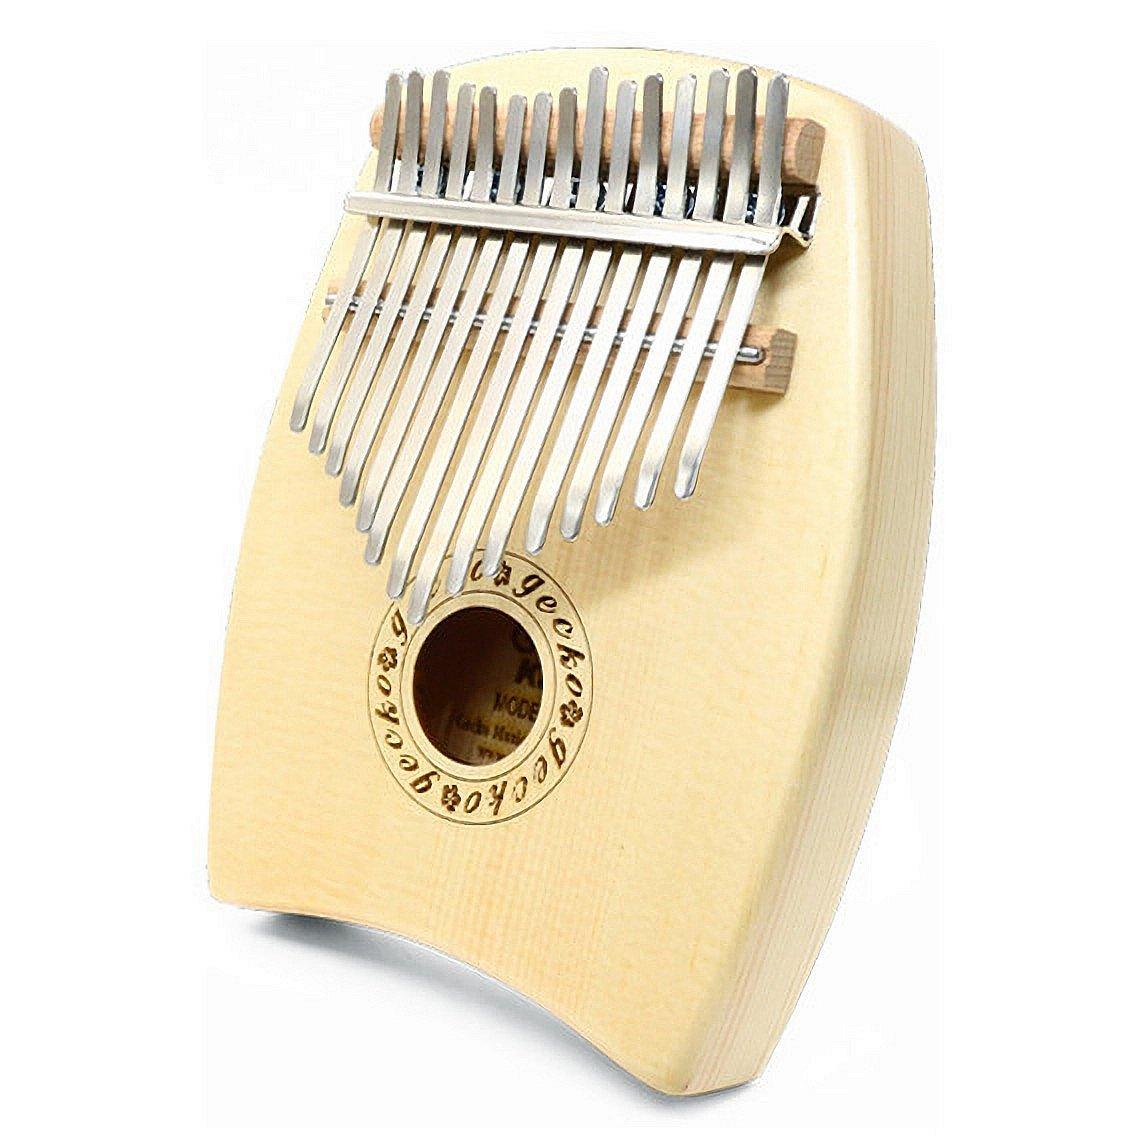 Gecko Spruce Tone Wood 15 Keys Kalimba, Acoustic Finger Thumb Piano Instrument Gift